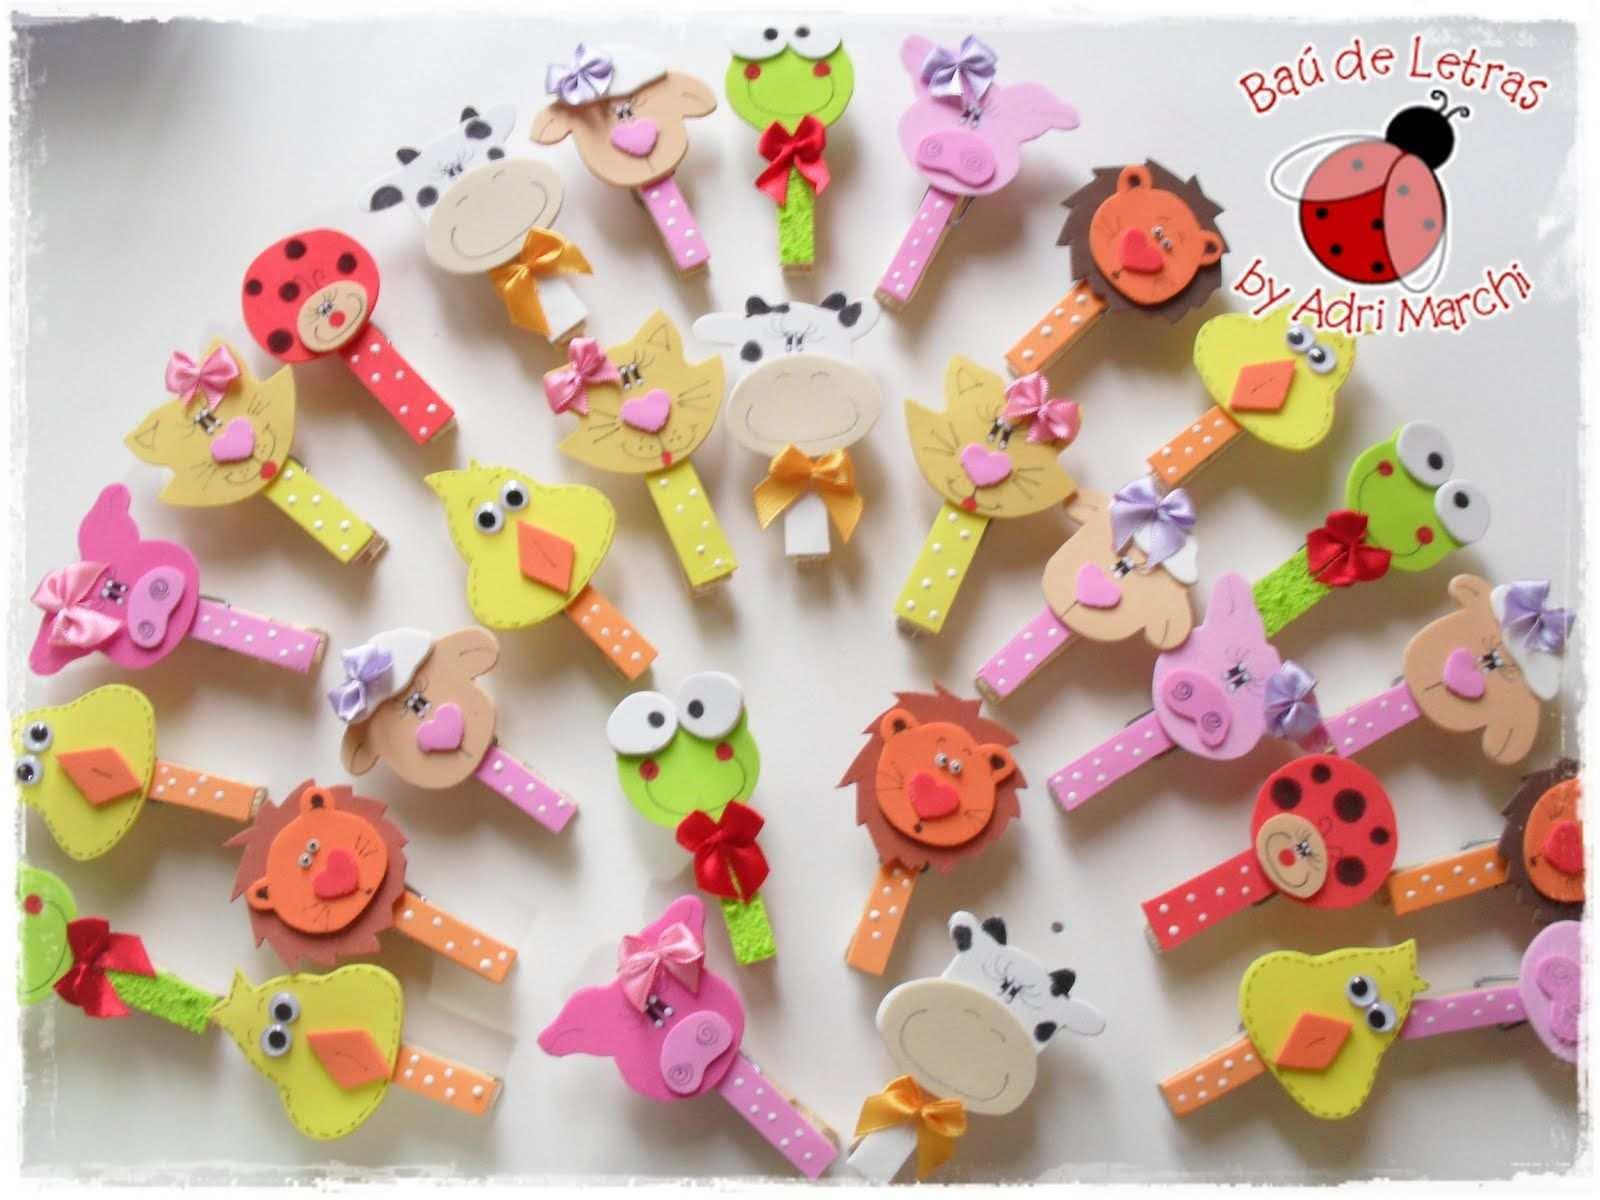 Http 1 Bp Blogspot Com Ymtztpi9vge Twq5rrlzcyi Aaaaaaaae4y Yjw6akla4j0 S1600 Sam 0953 Jpg Crafts For Kids Crafts Clothes Pin Crafts